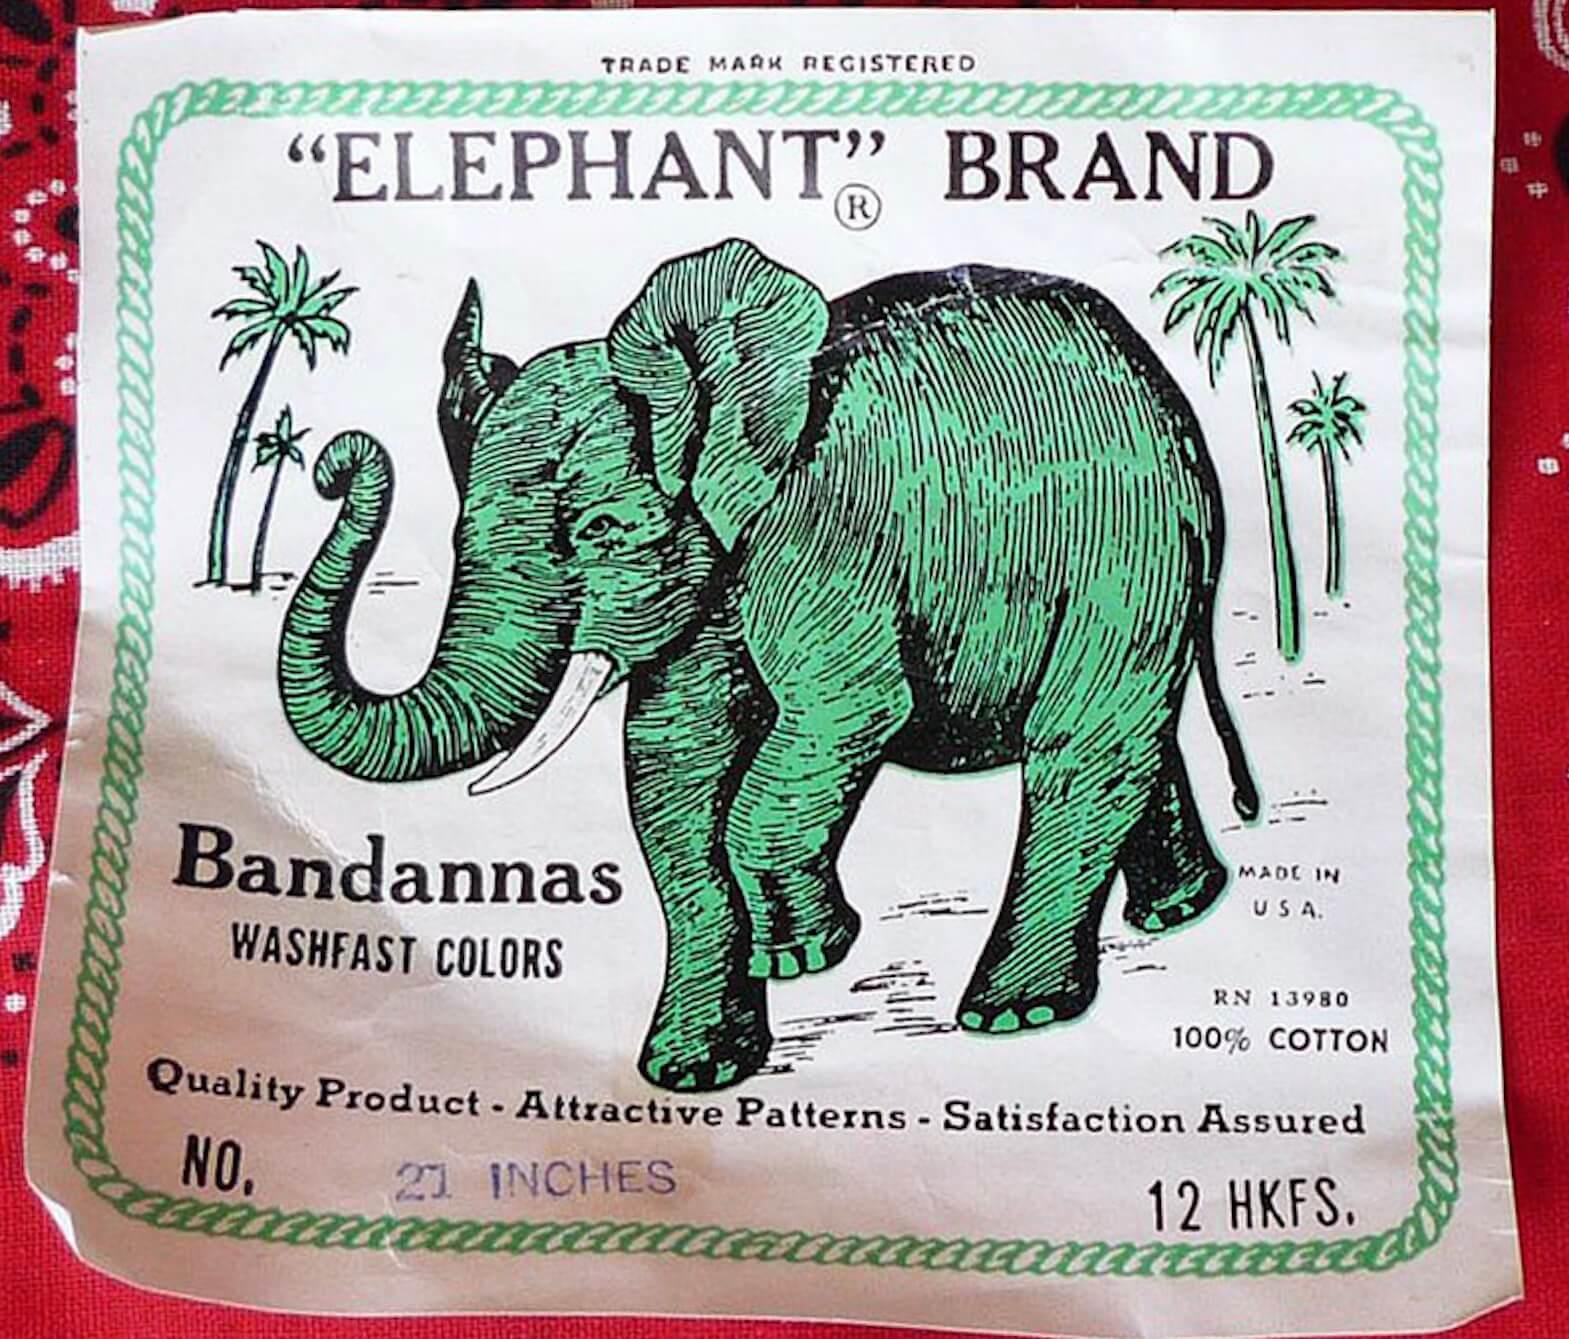 elephant brand bandannas tag